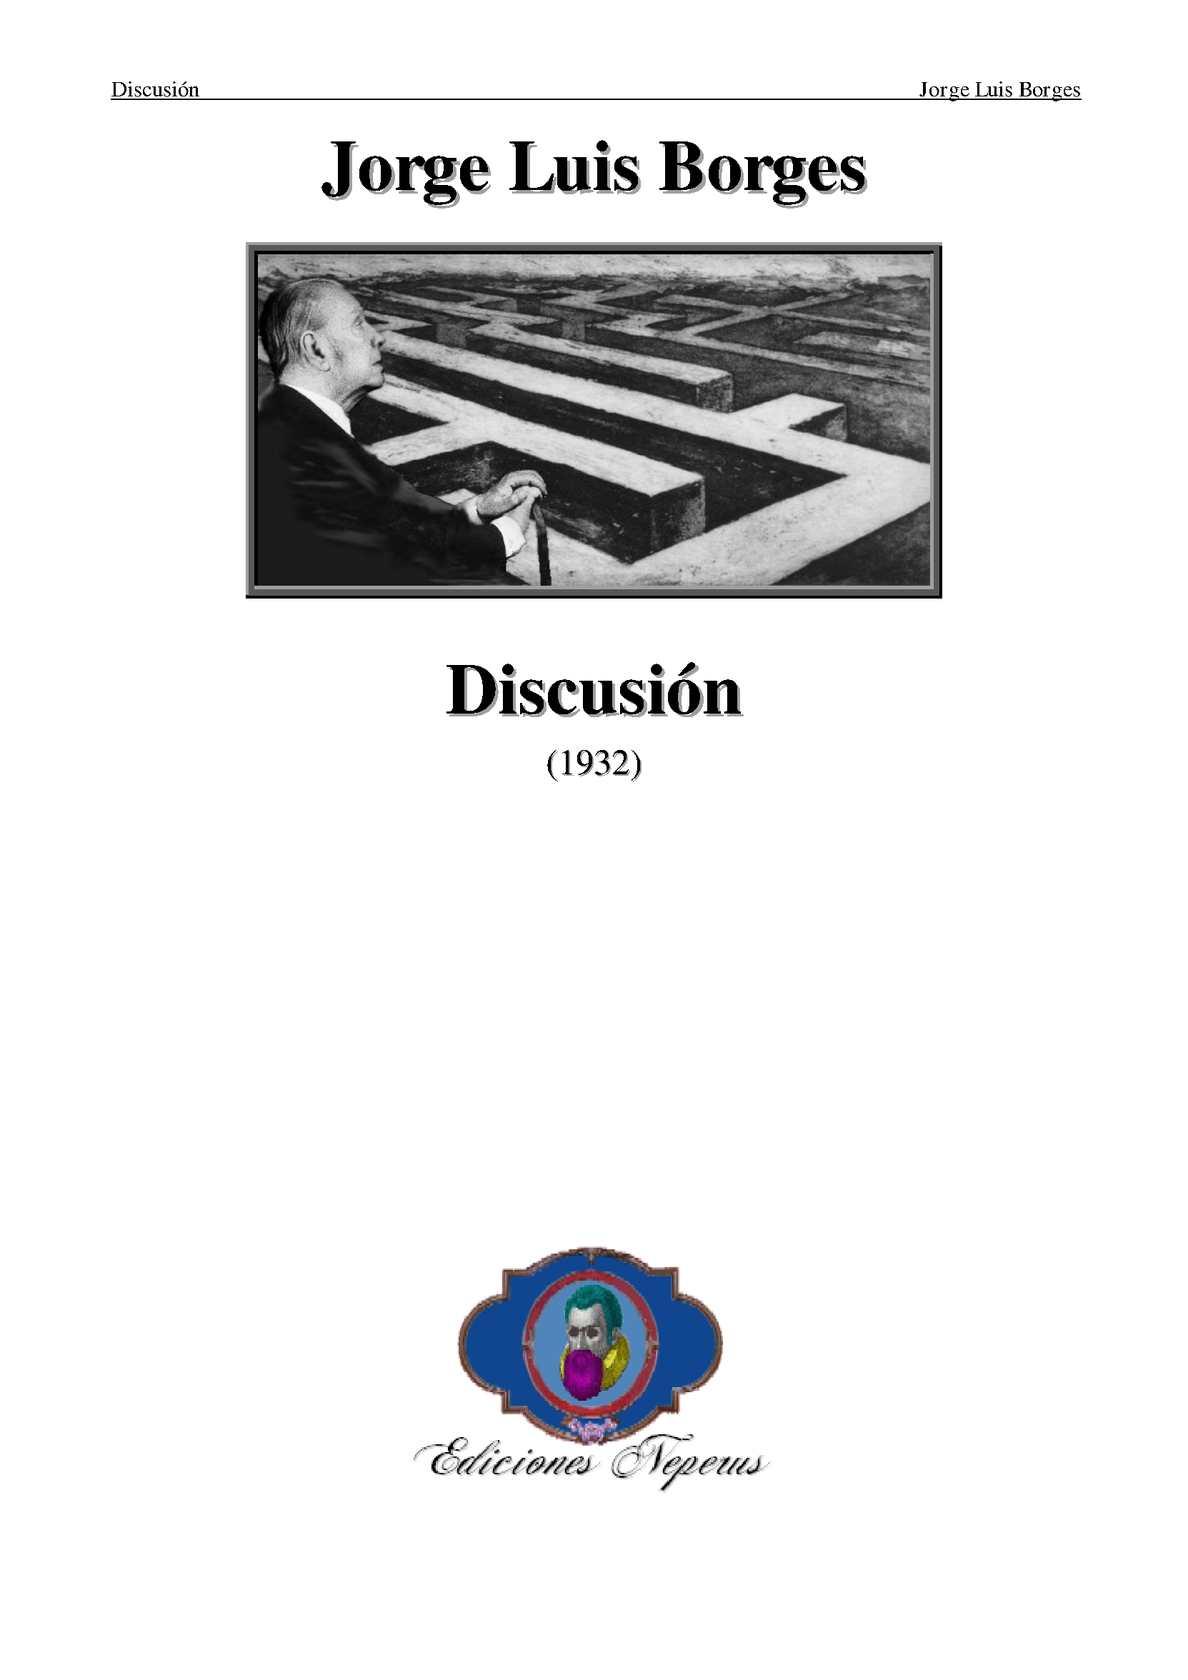 Calaméo - Jorge Luis Borges: Discusión 1932